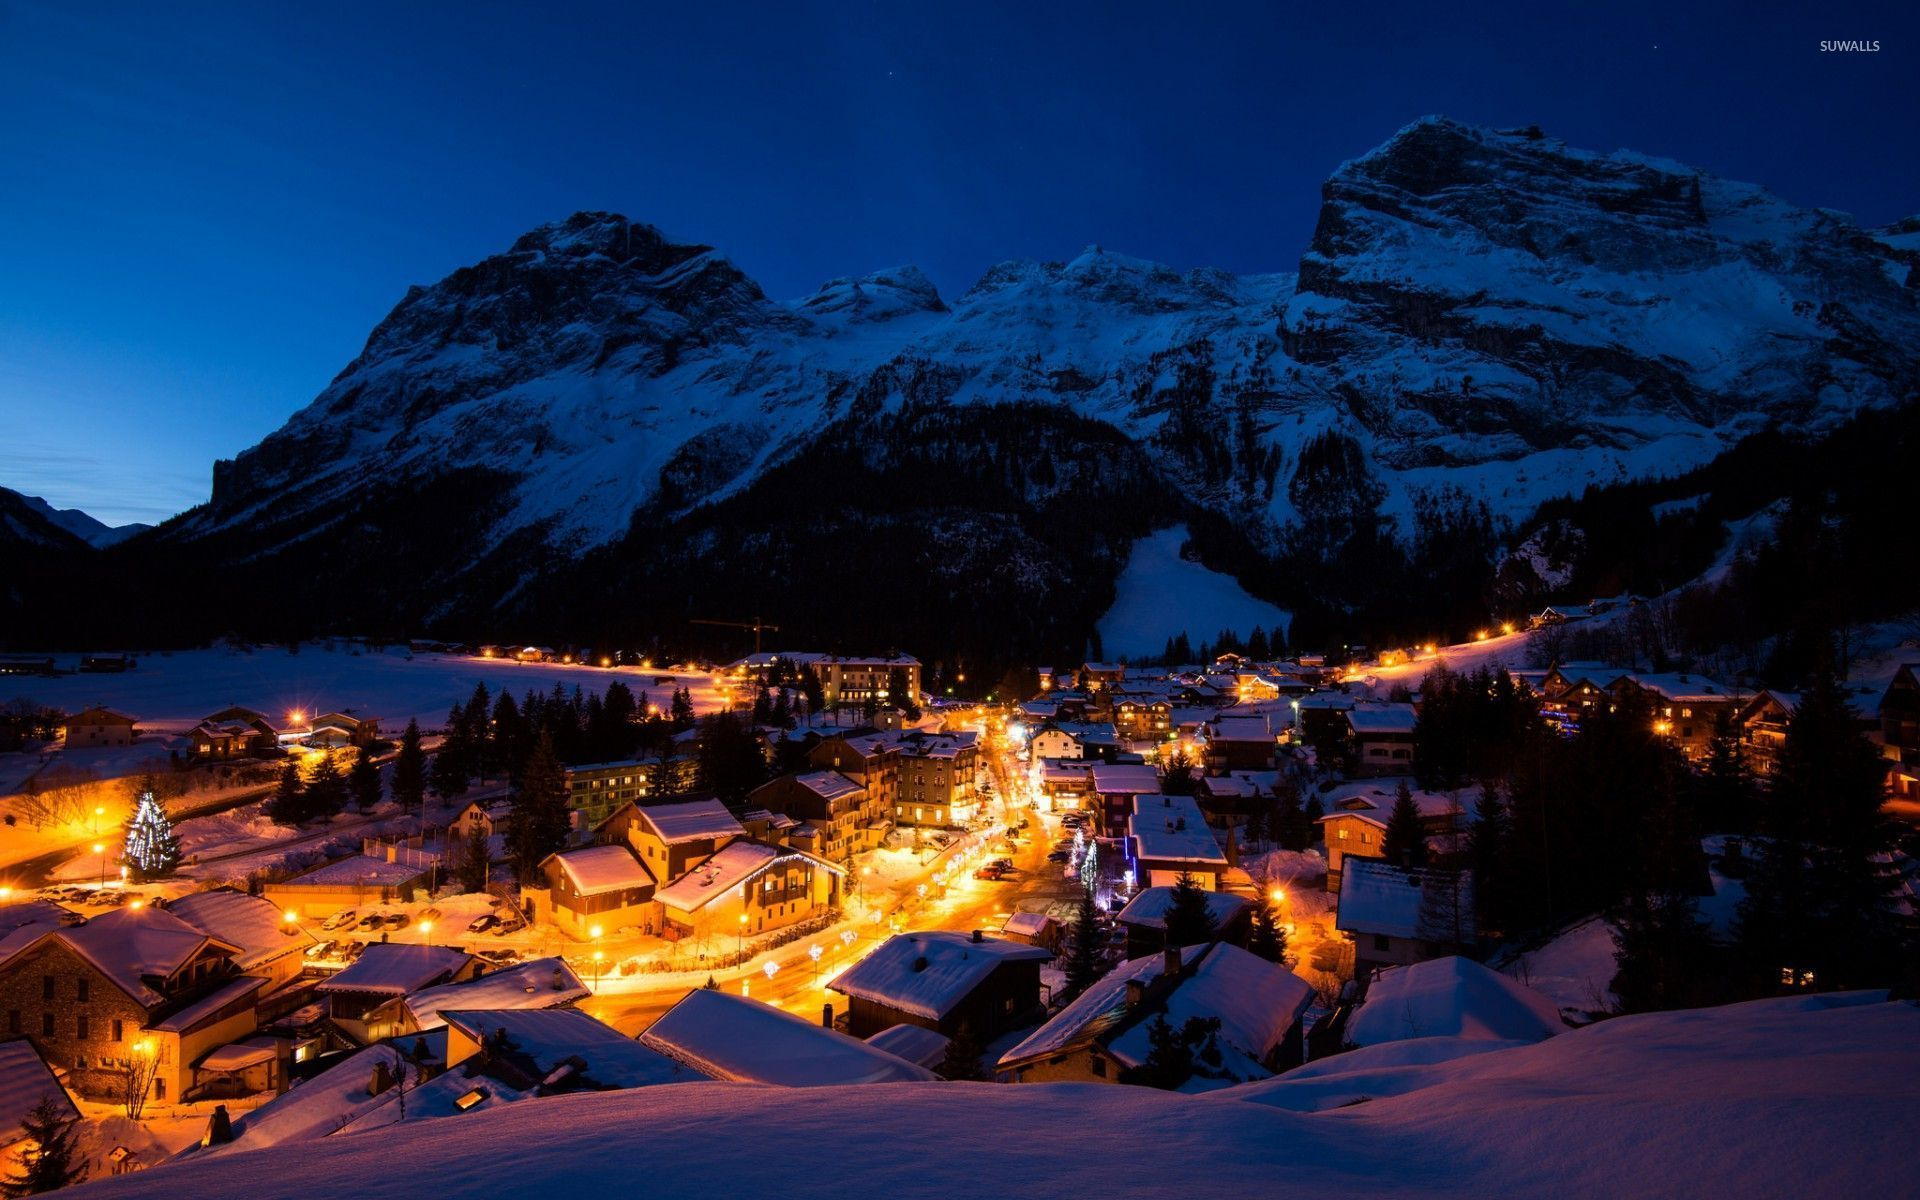 Night mountain wallpapers top free night mountain - Night mountain wallpaper 4k ...